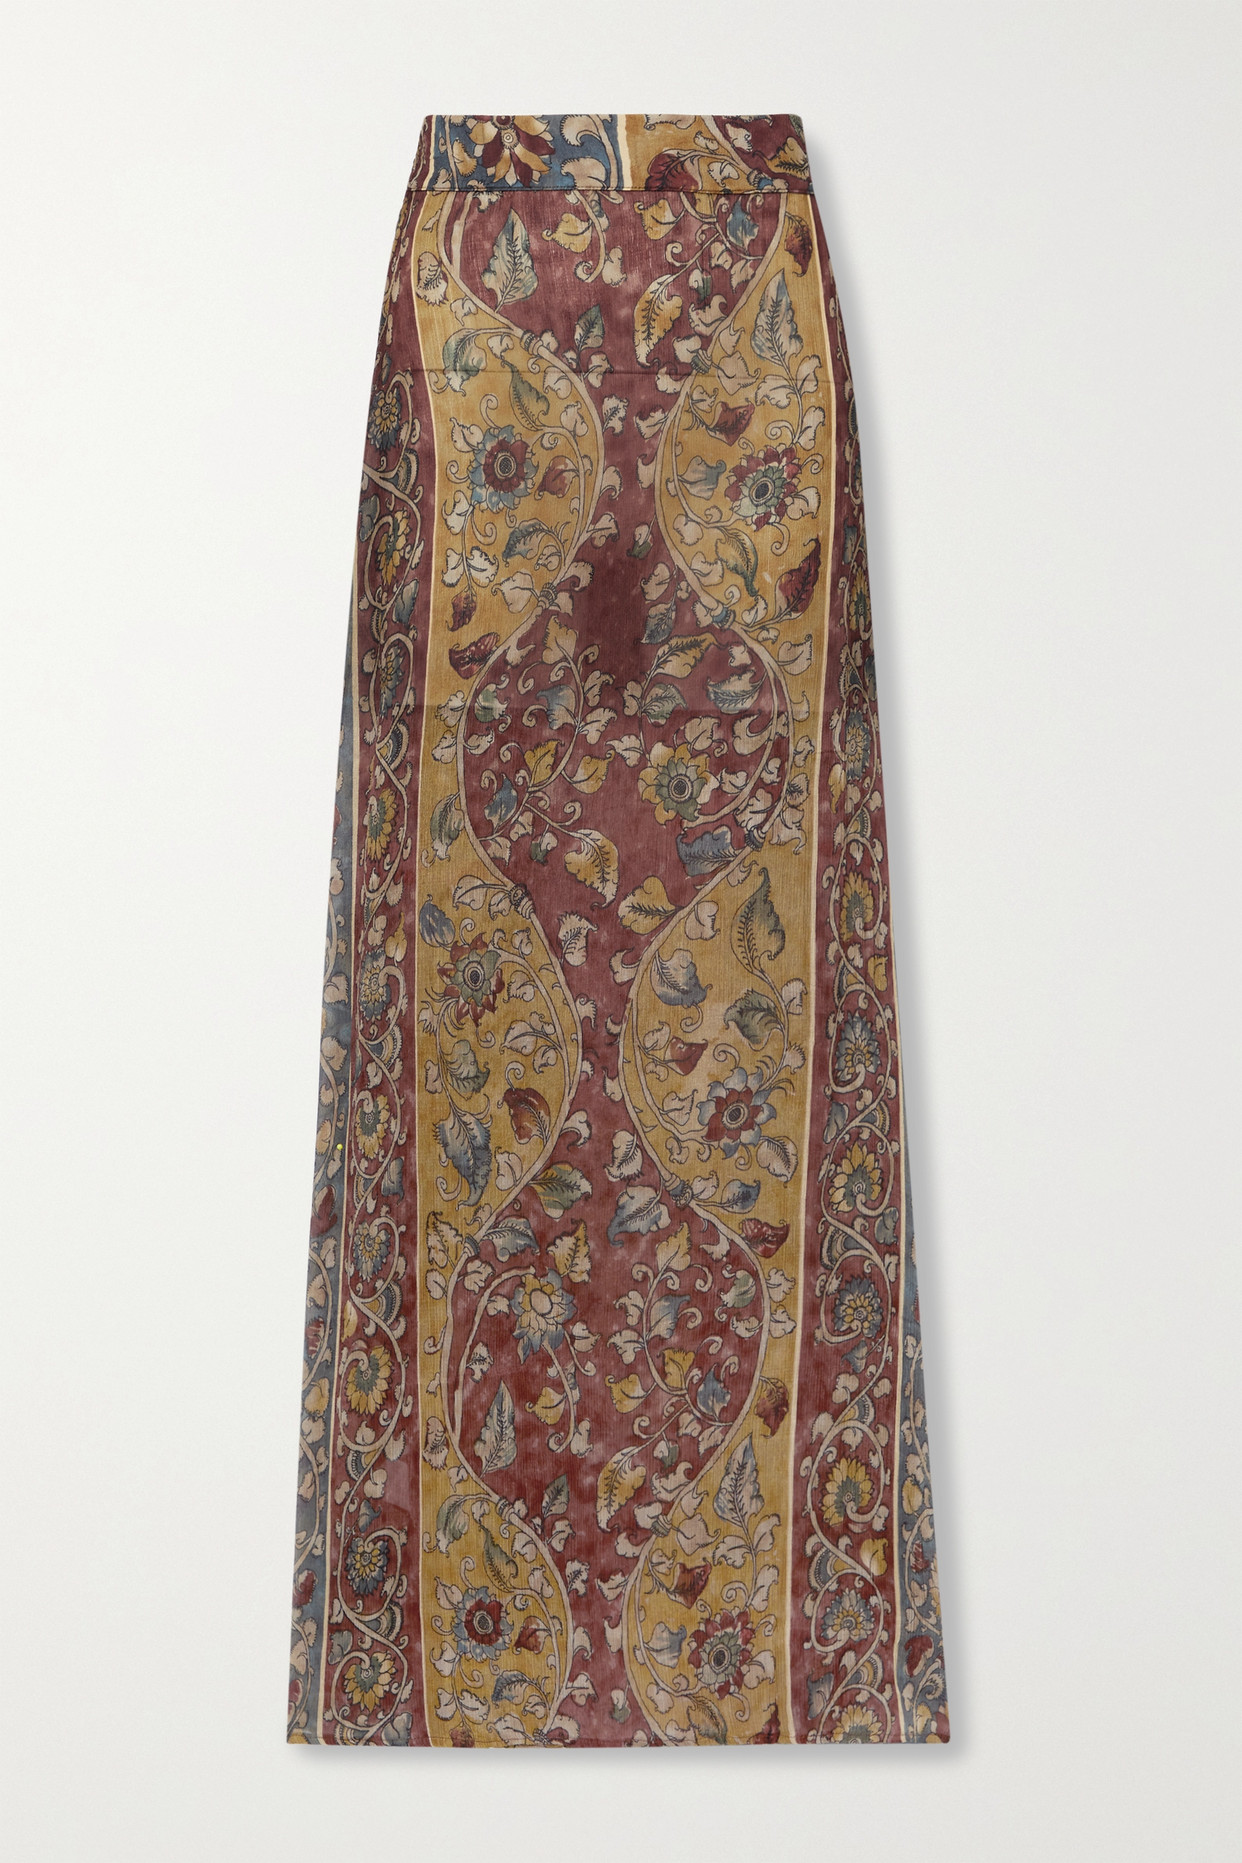 SAVANNAH MORROW THE LABEL - + Net Sustain Iris Printed Silk-crepon Maxi Skirt - Brown - x small